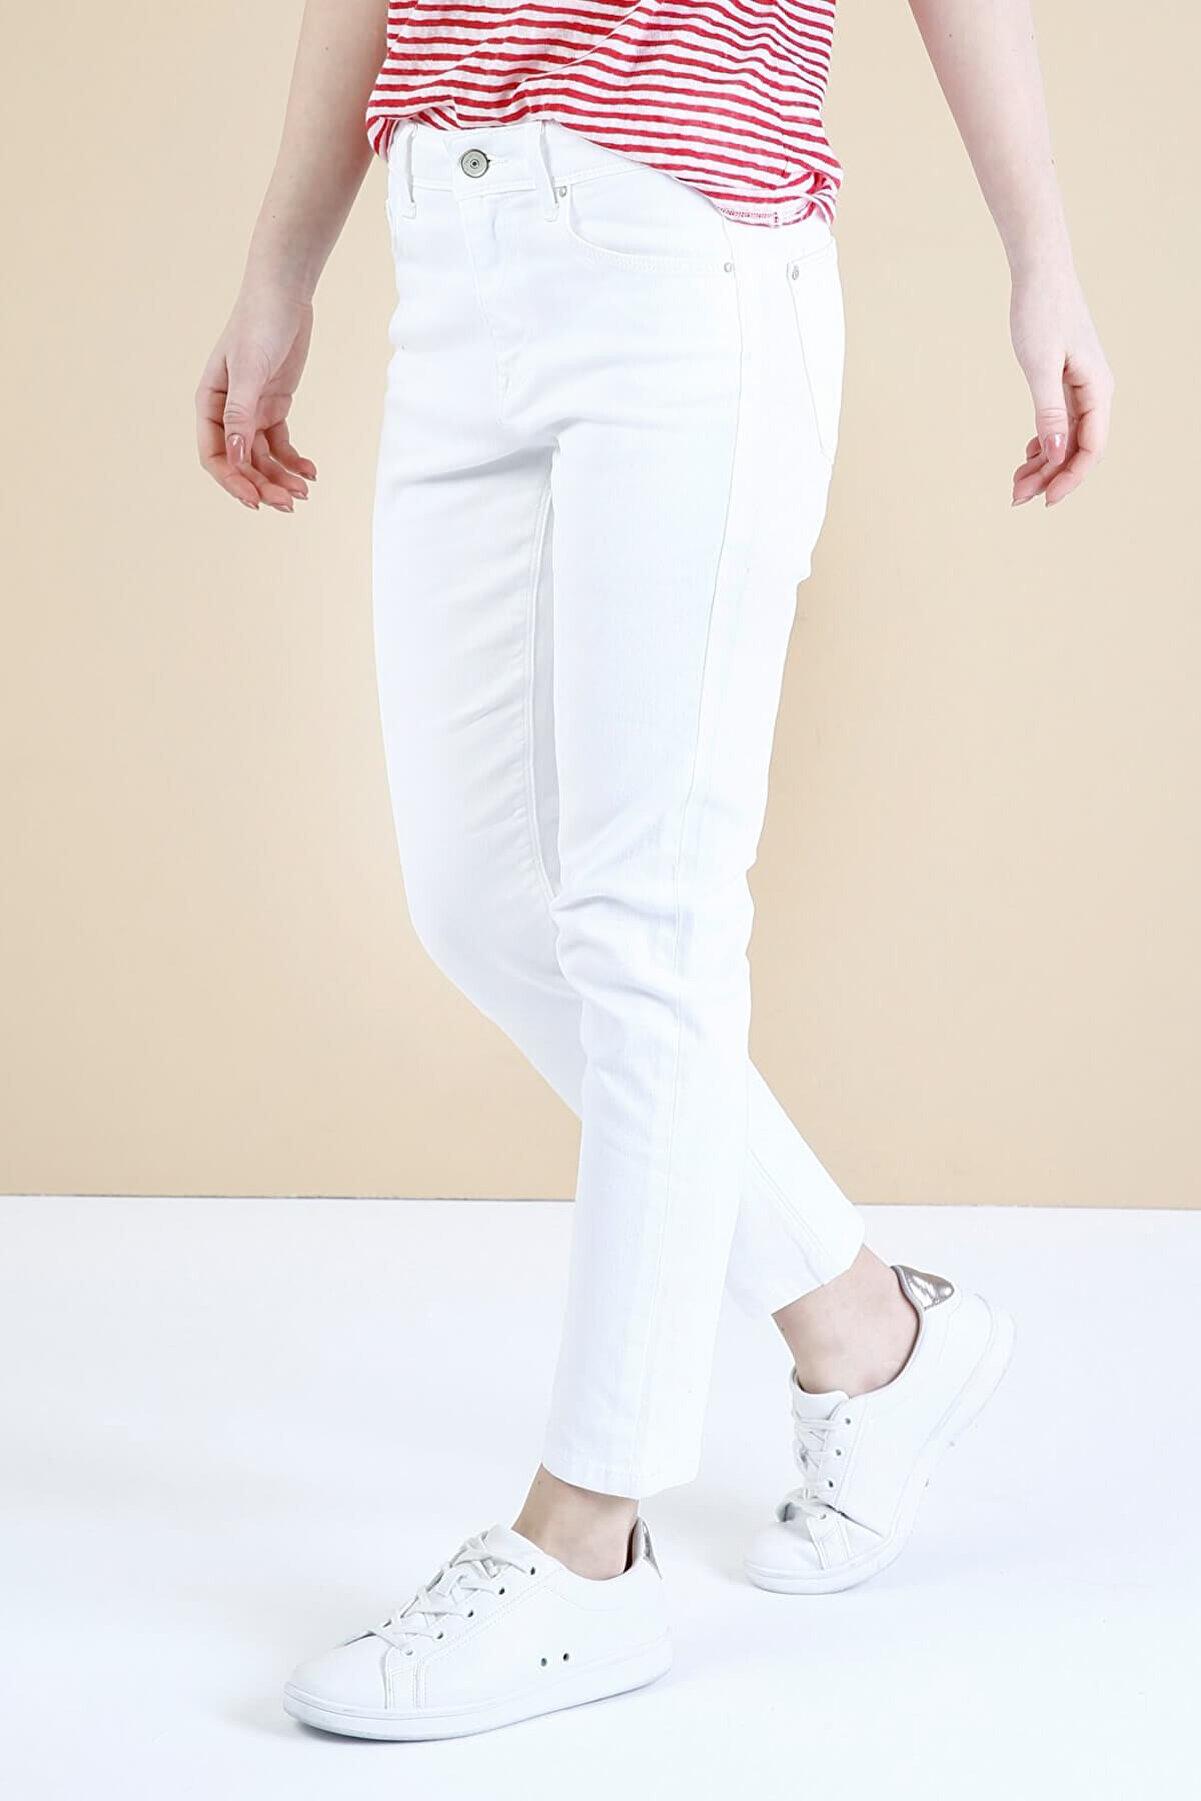 Colin's KADIN 891 Maya Yüksek Bel Düz Paça Cigarette Fit Beyaz Kadın Jean Pantolon CL1034739